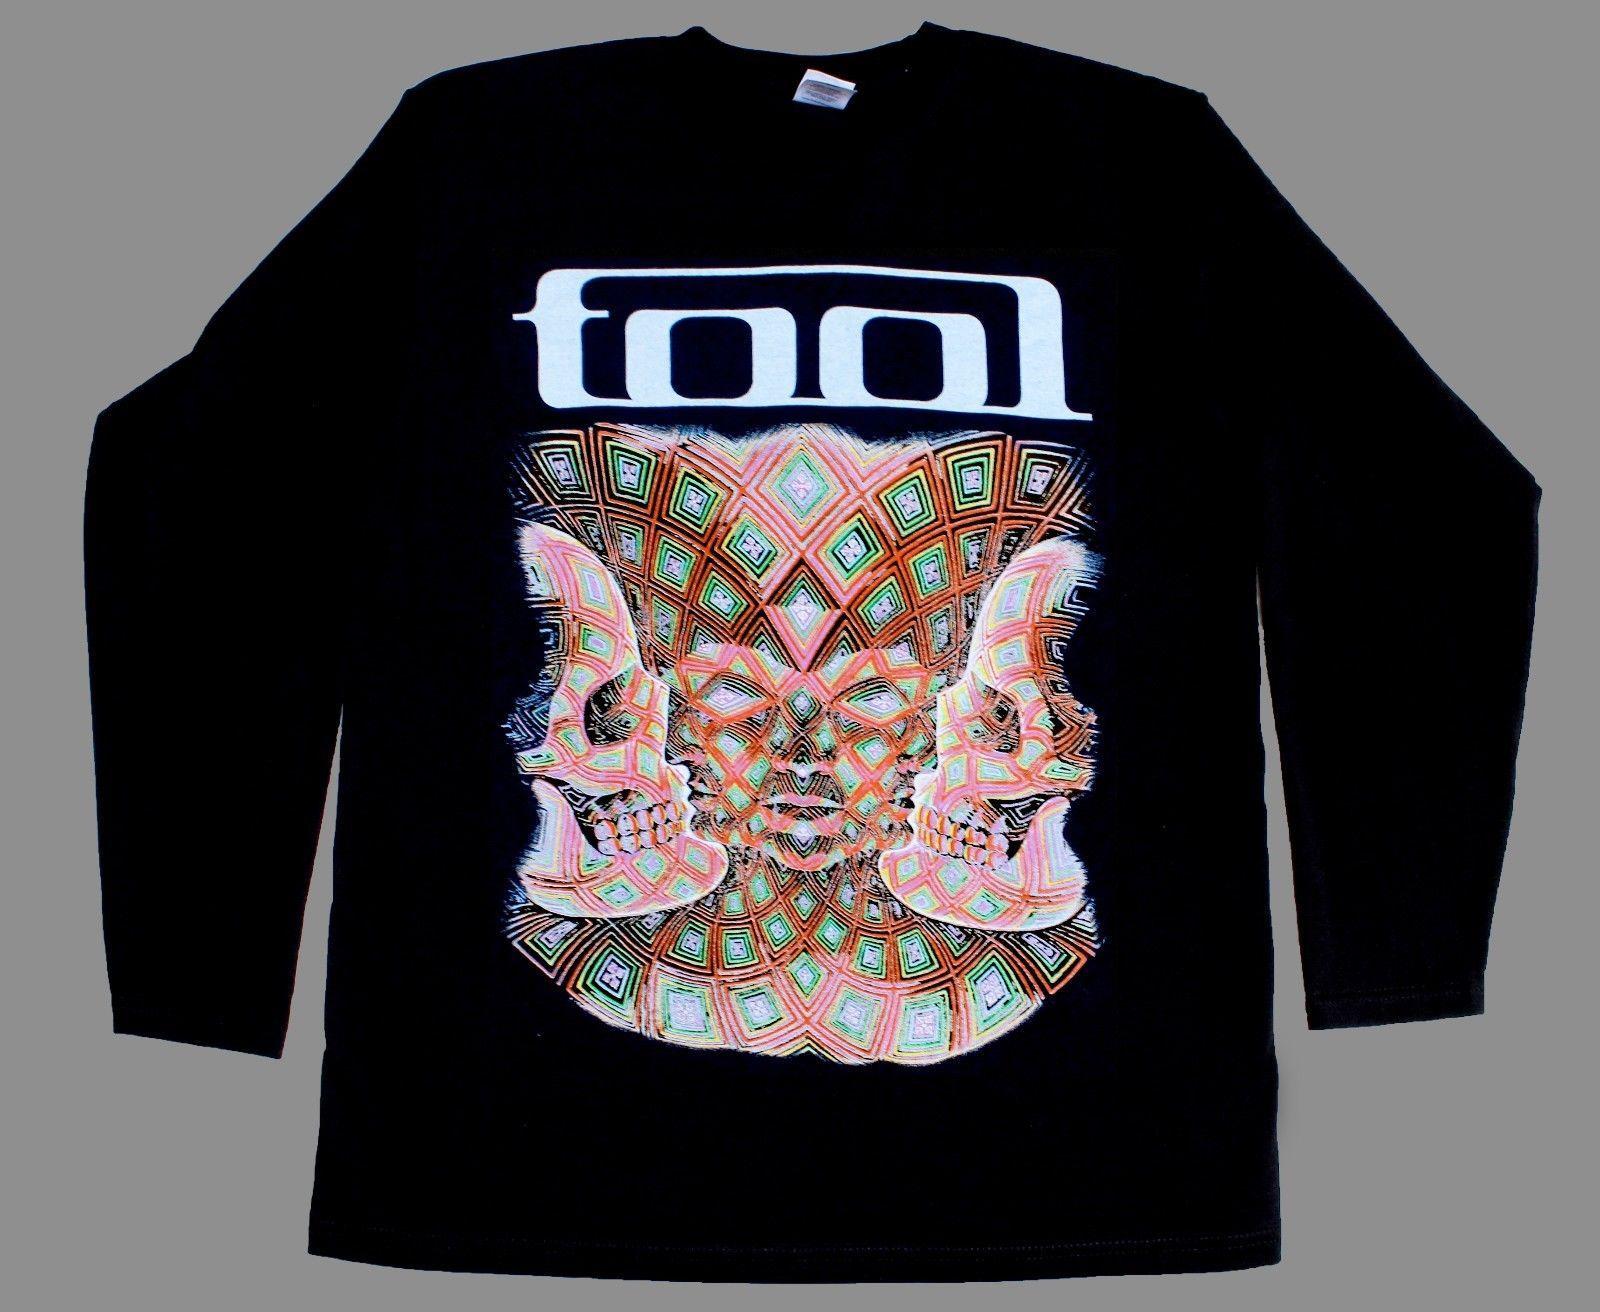 085ccb2b TOOL BAND ALTERNATIVE PROGRESSIVE METAL NEW BLACK LONG SLEEVE T SHIRT Print  On Tee Shirt Go T Shirts From Banwanyue2, $15.74  DHgate.Com